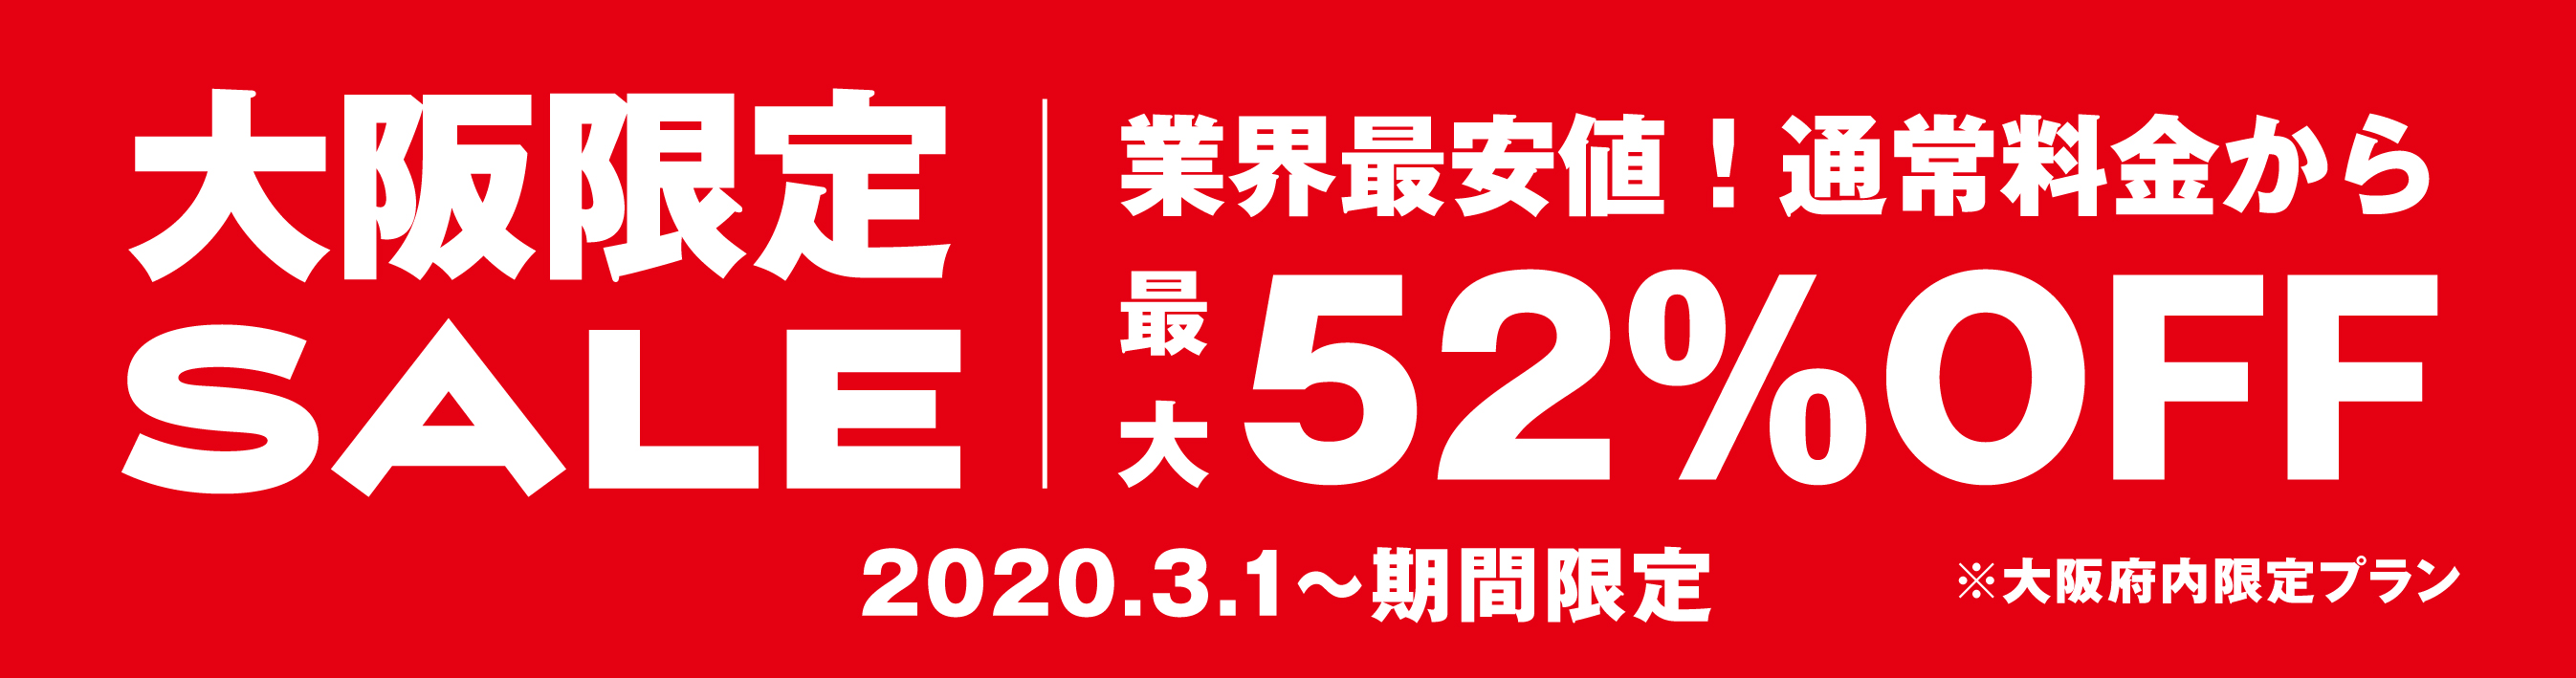 大阪限定SALE 業界最安値!通常料金から最大52%OFF